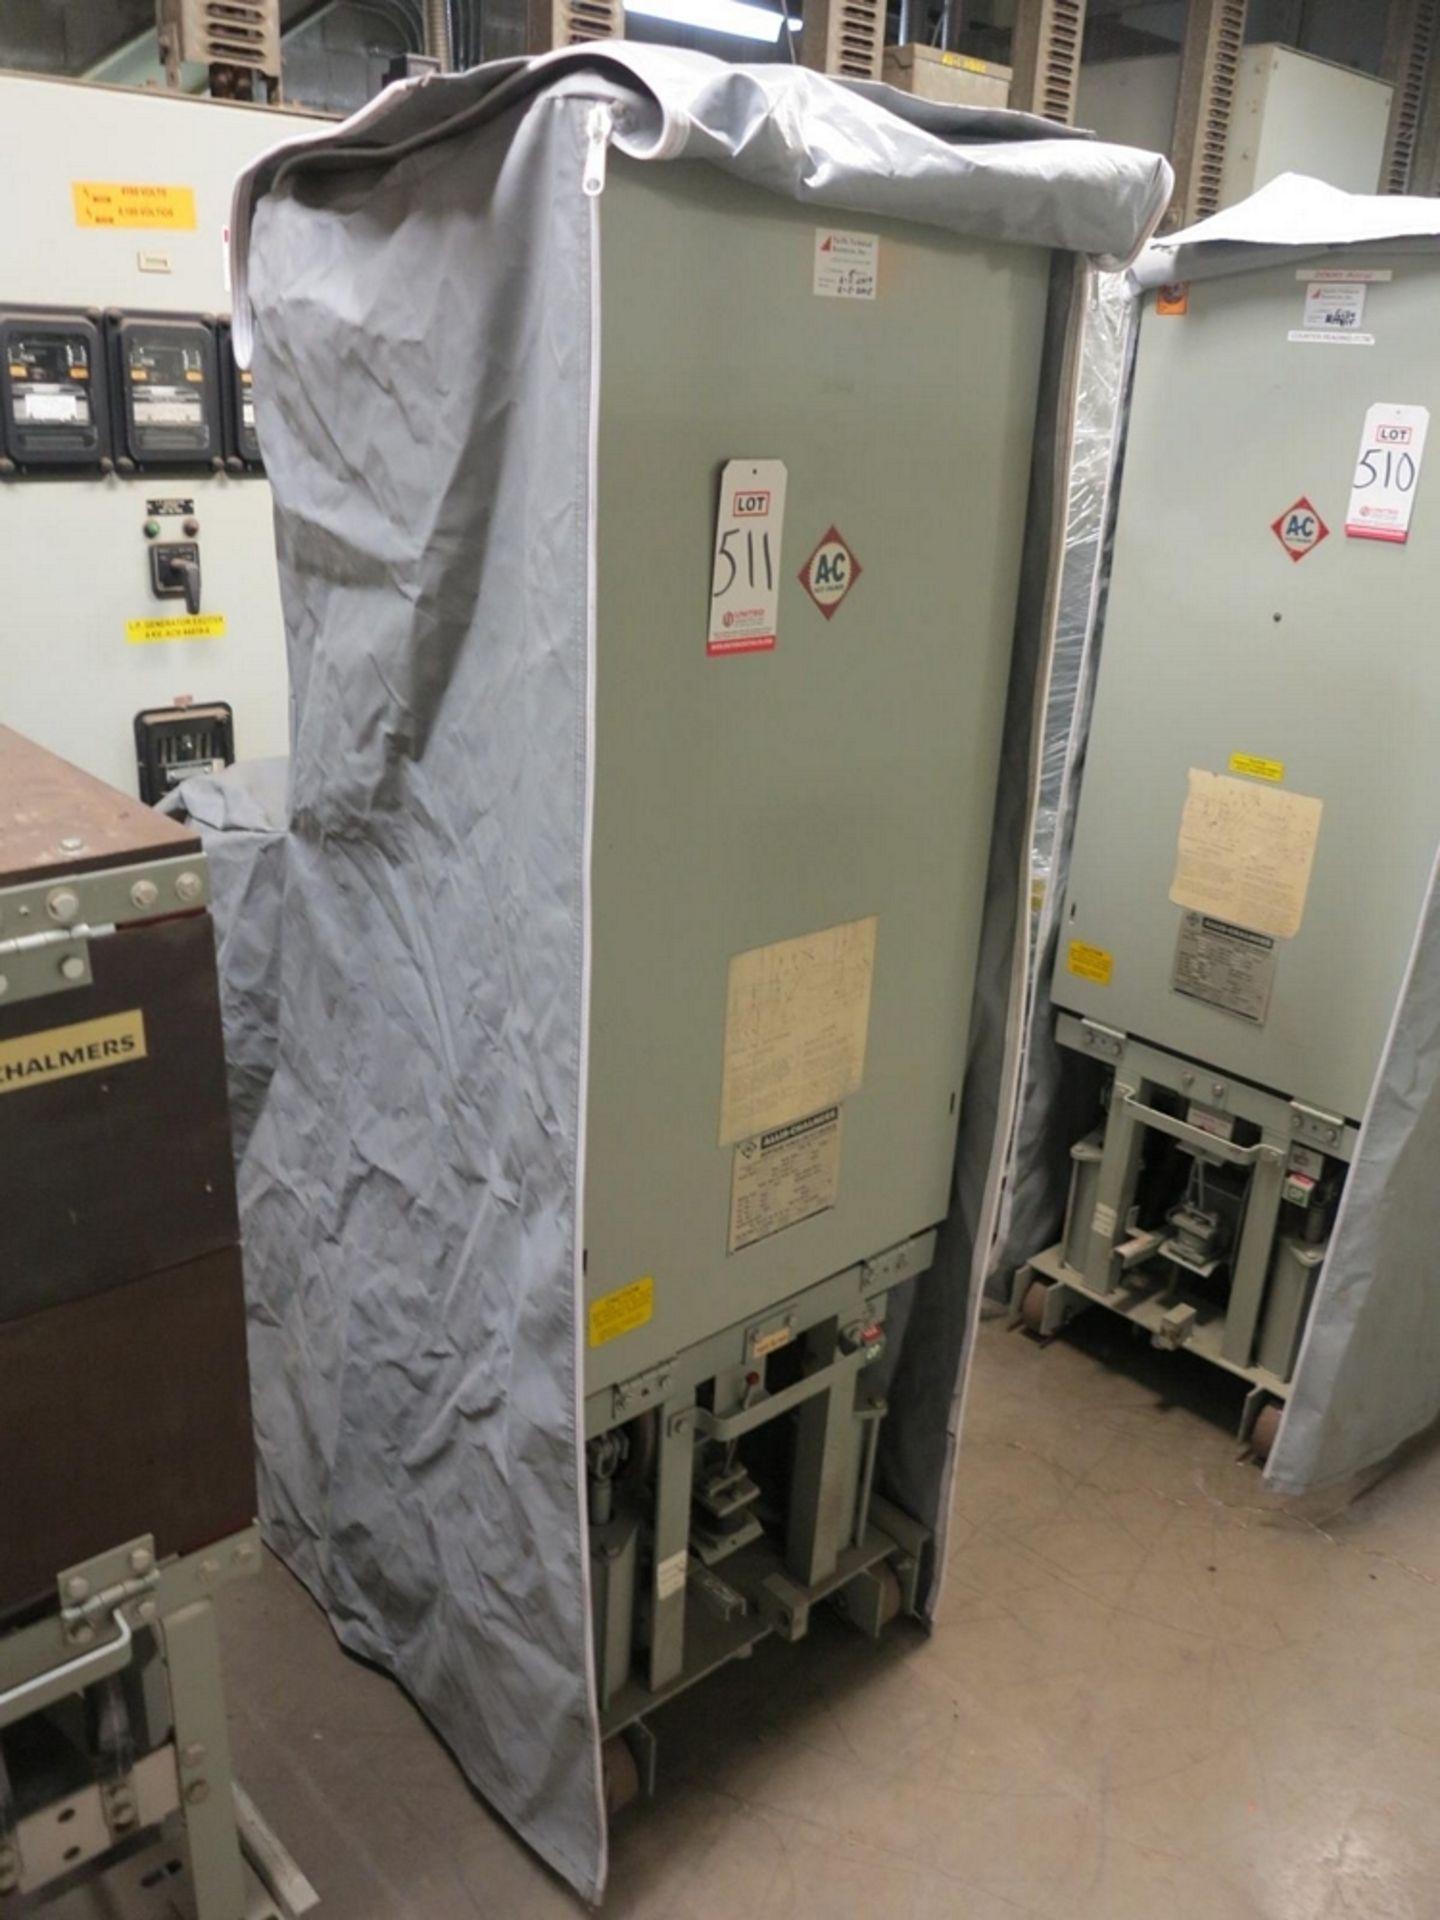 Lot 511 - ALLIS CHALMERS CIRCUIT BREAKER, TYPE MA-250A-1, 4160 V, 1200 A